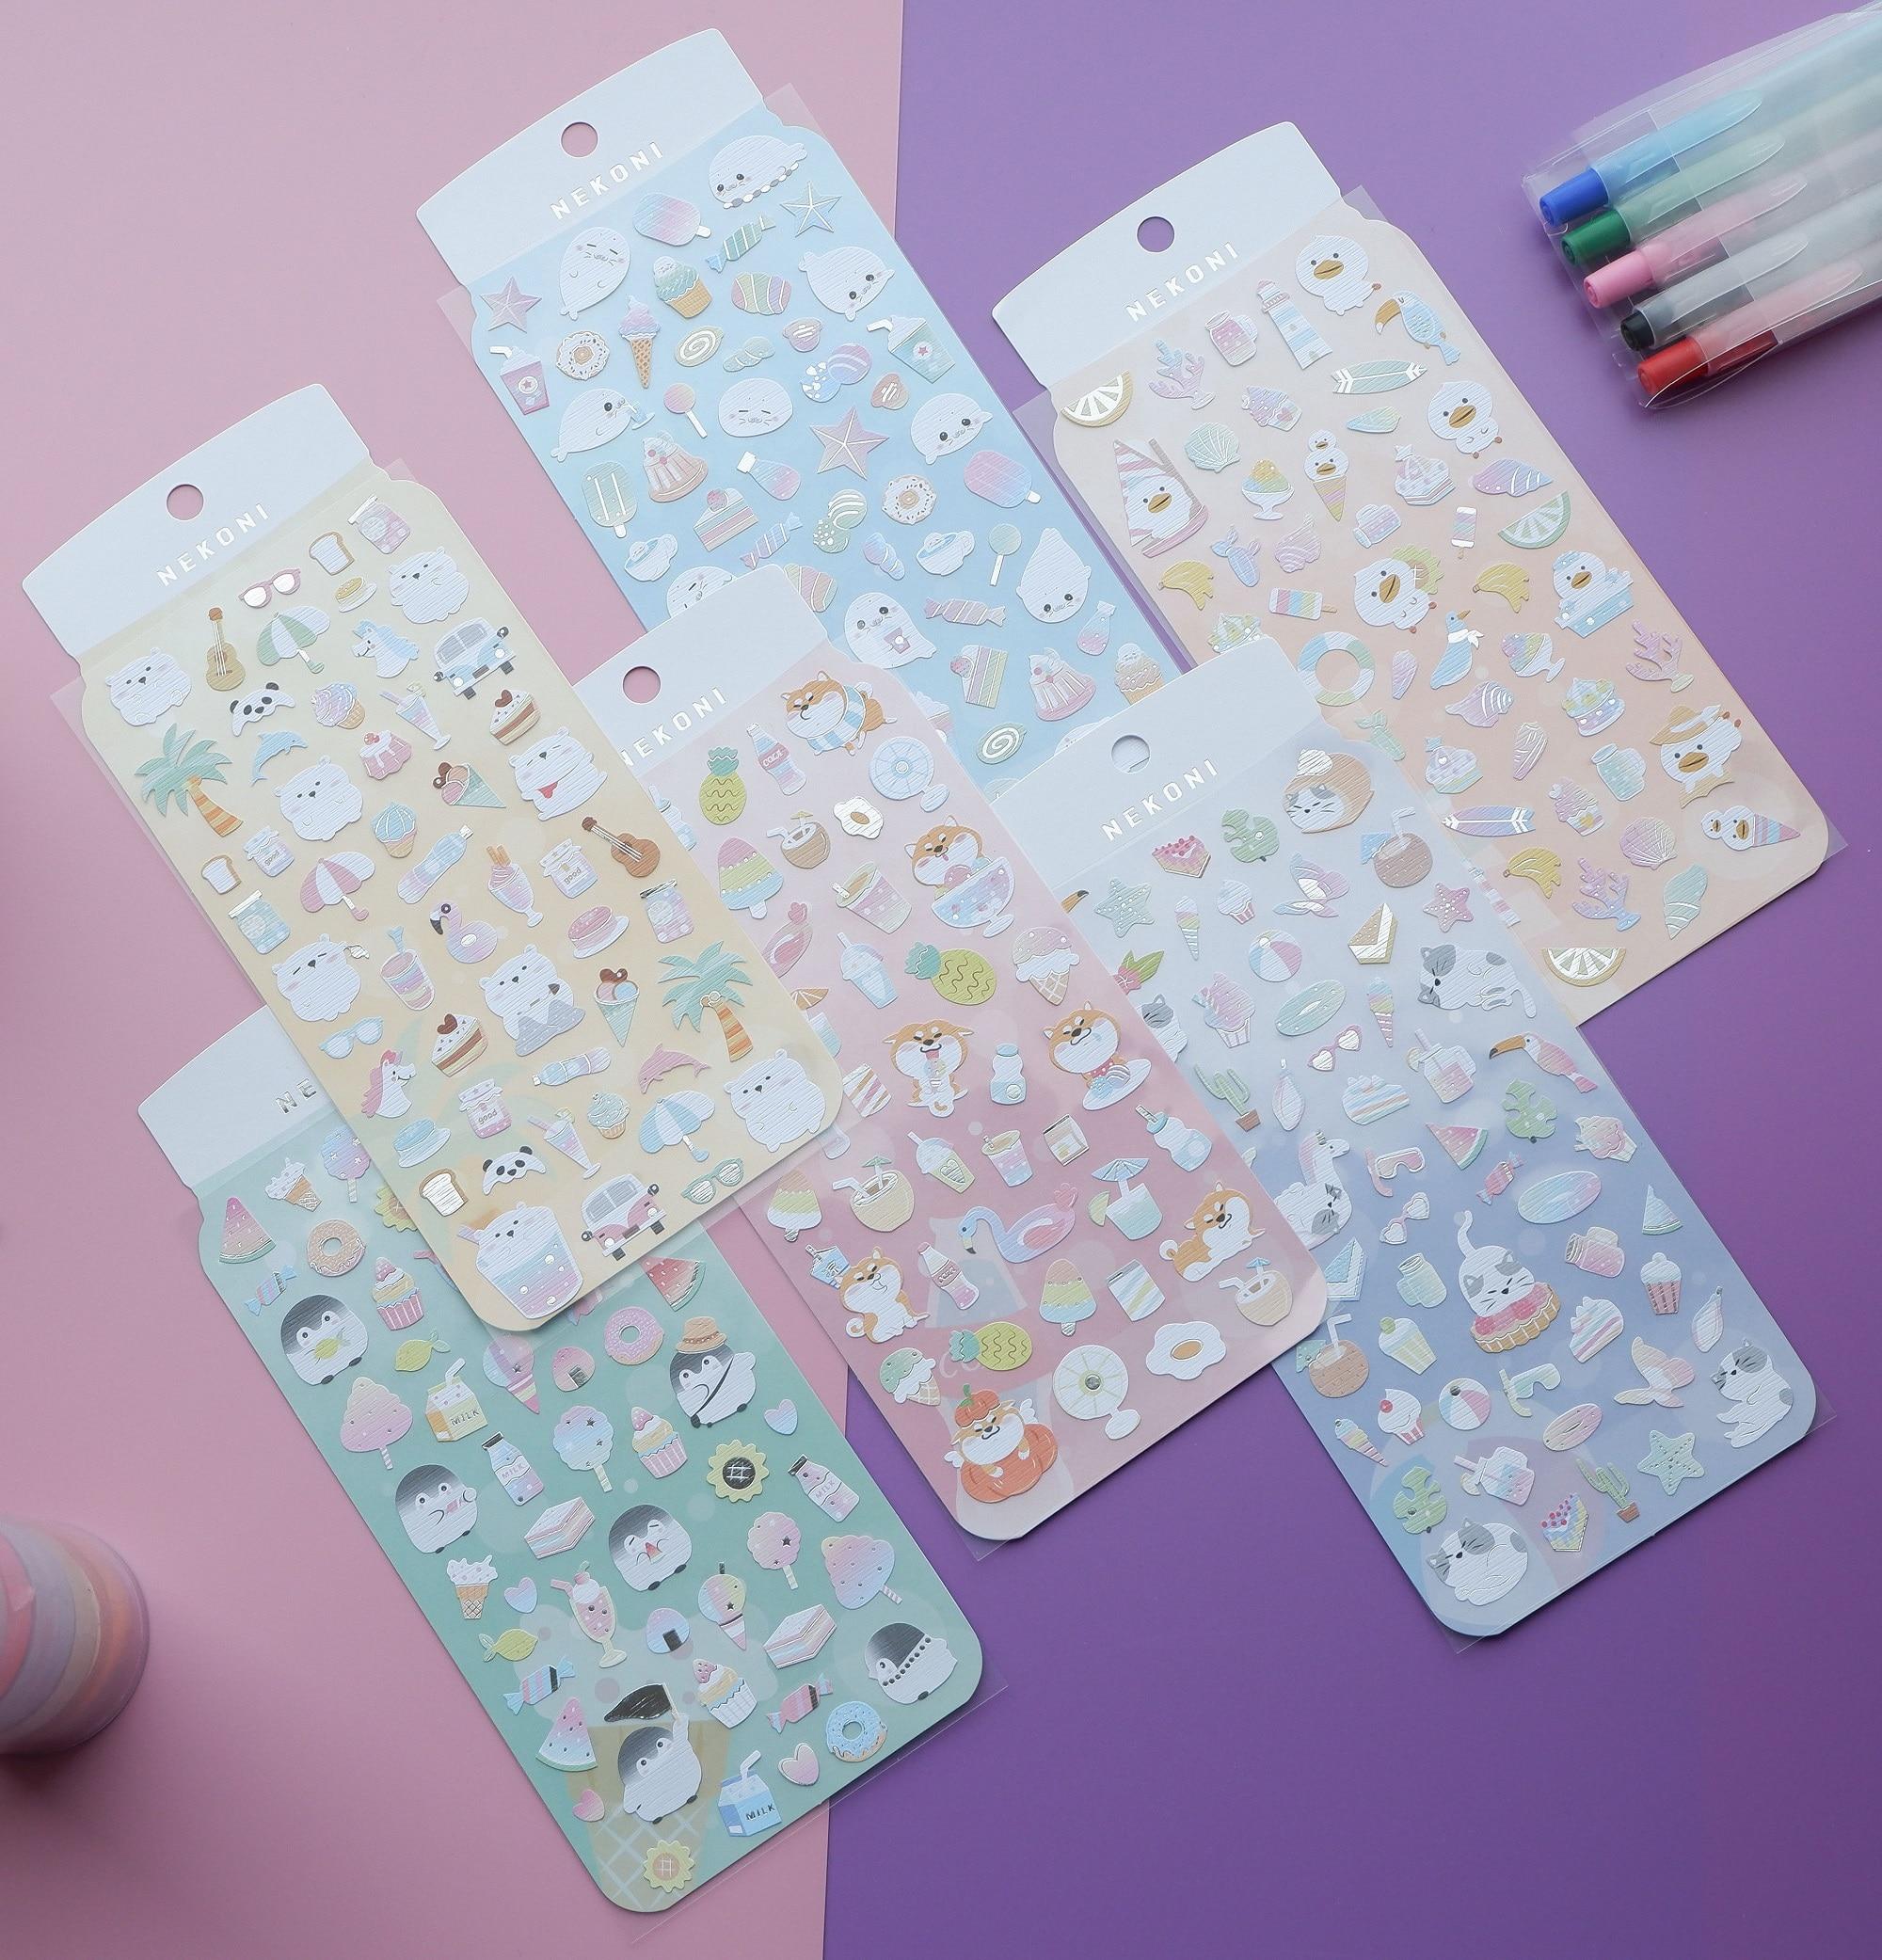 Animal Cold Drink Ice Cream Kawaii Bullet Journal Plane Decorative Stationery Stickers Scrapbooking DIY Diary Album Stick Label